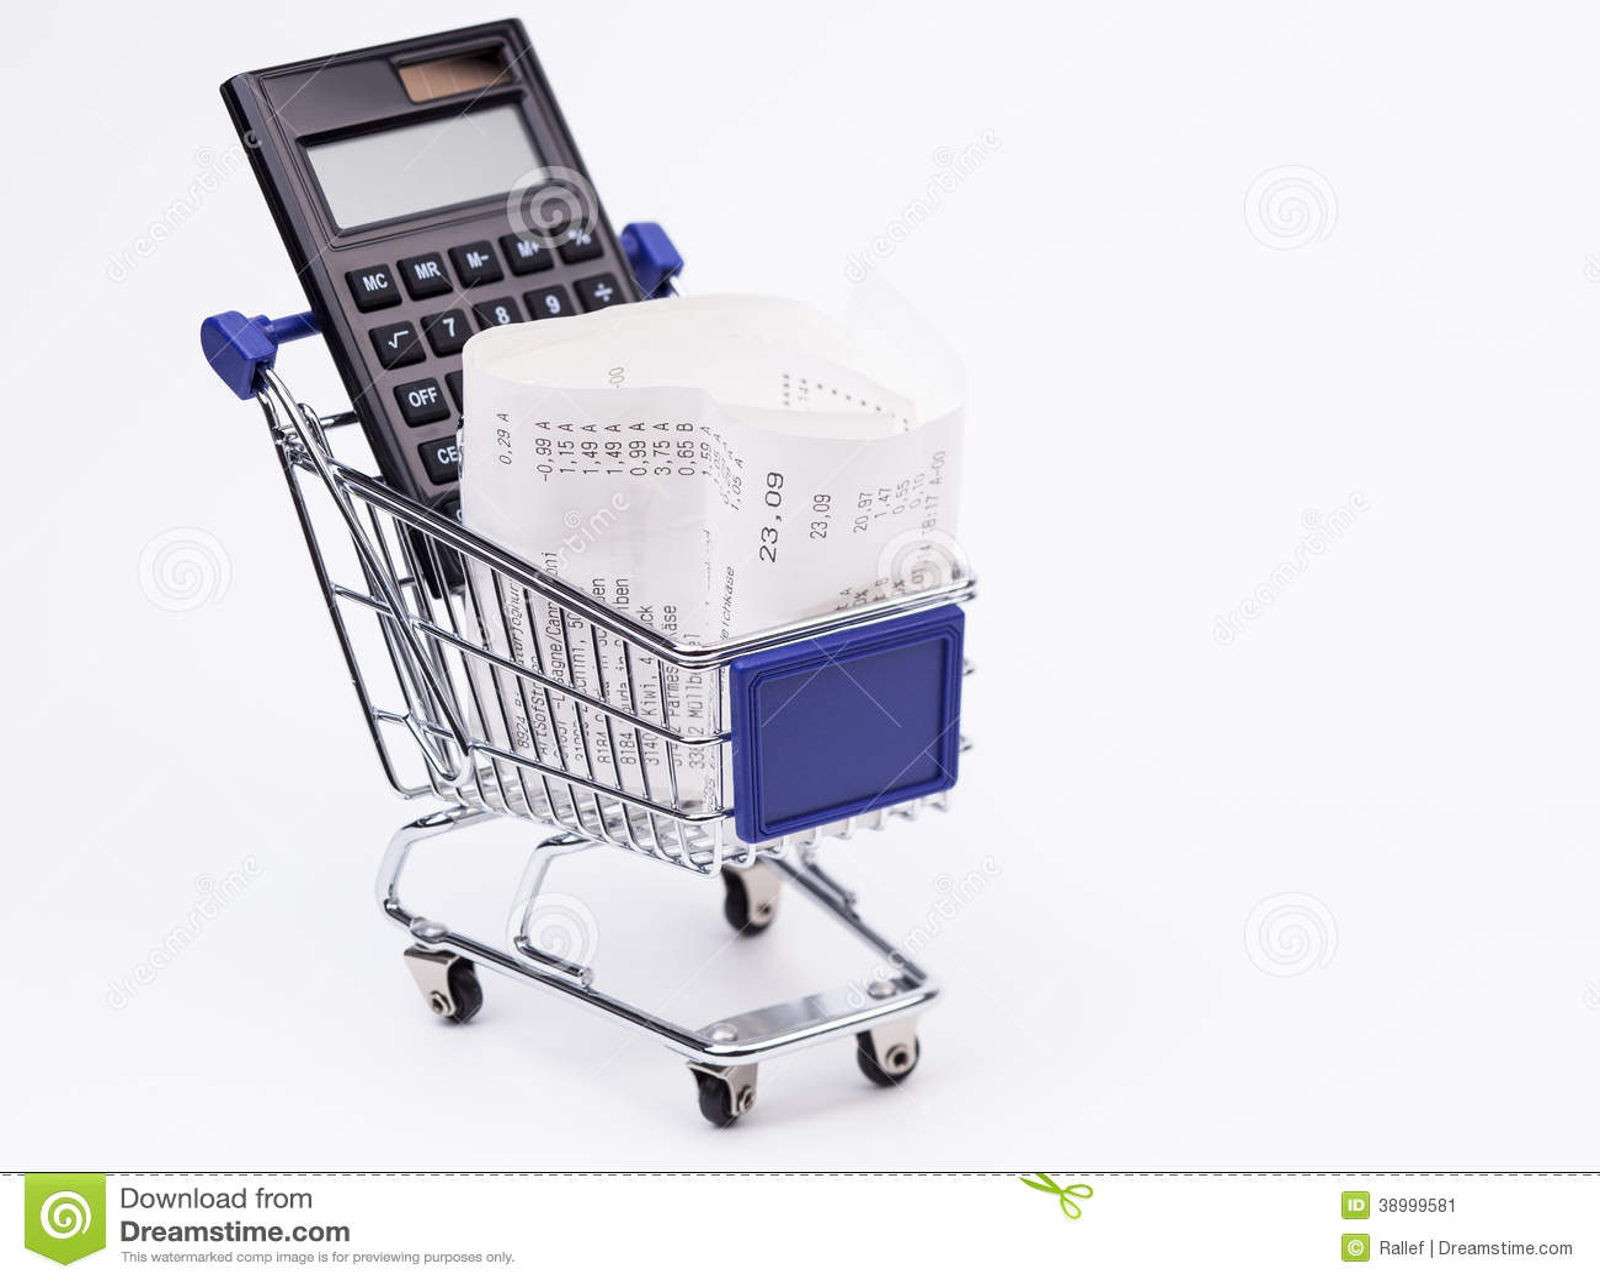 shopping till receipt calculator and cart stock photo